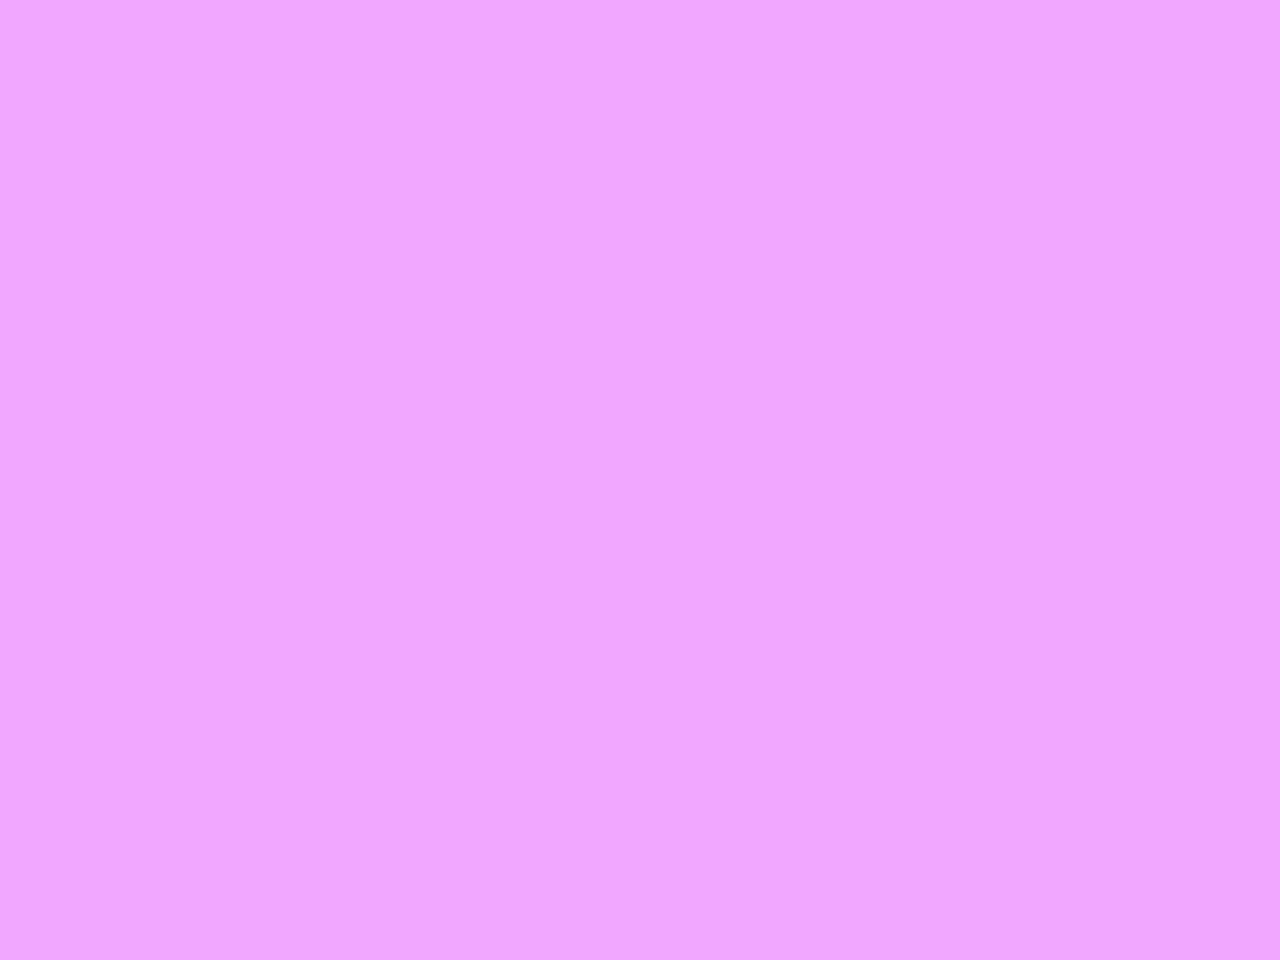 1280x960 Rich Brilliant Lavender Solid Color Background